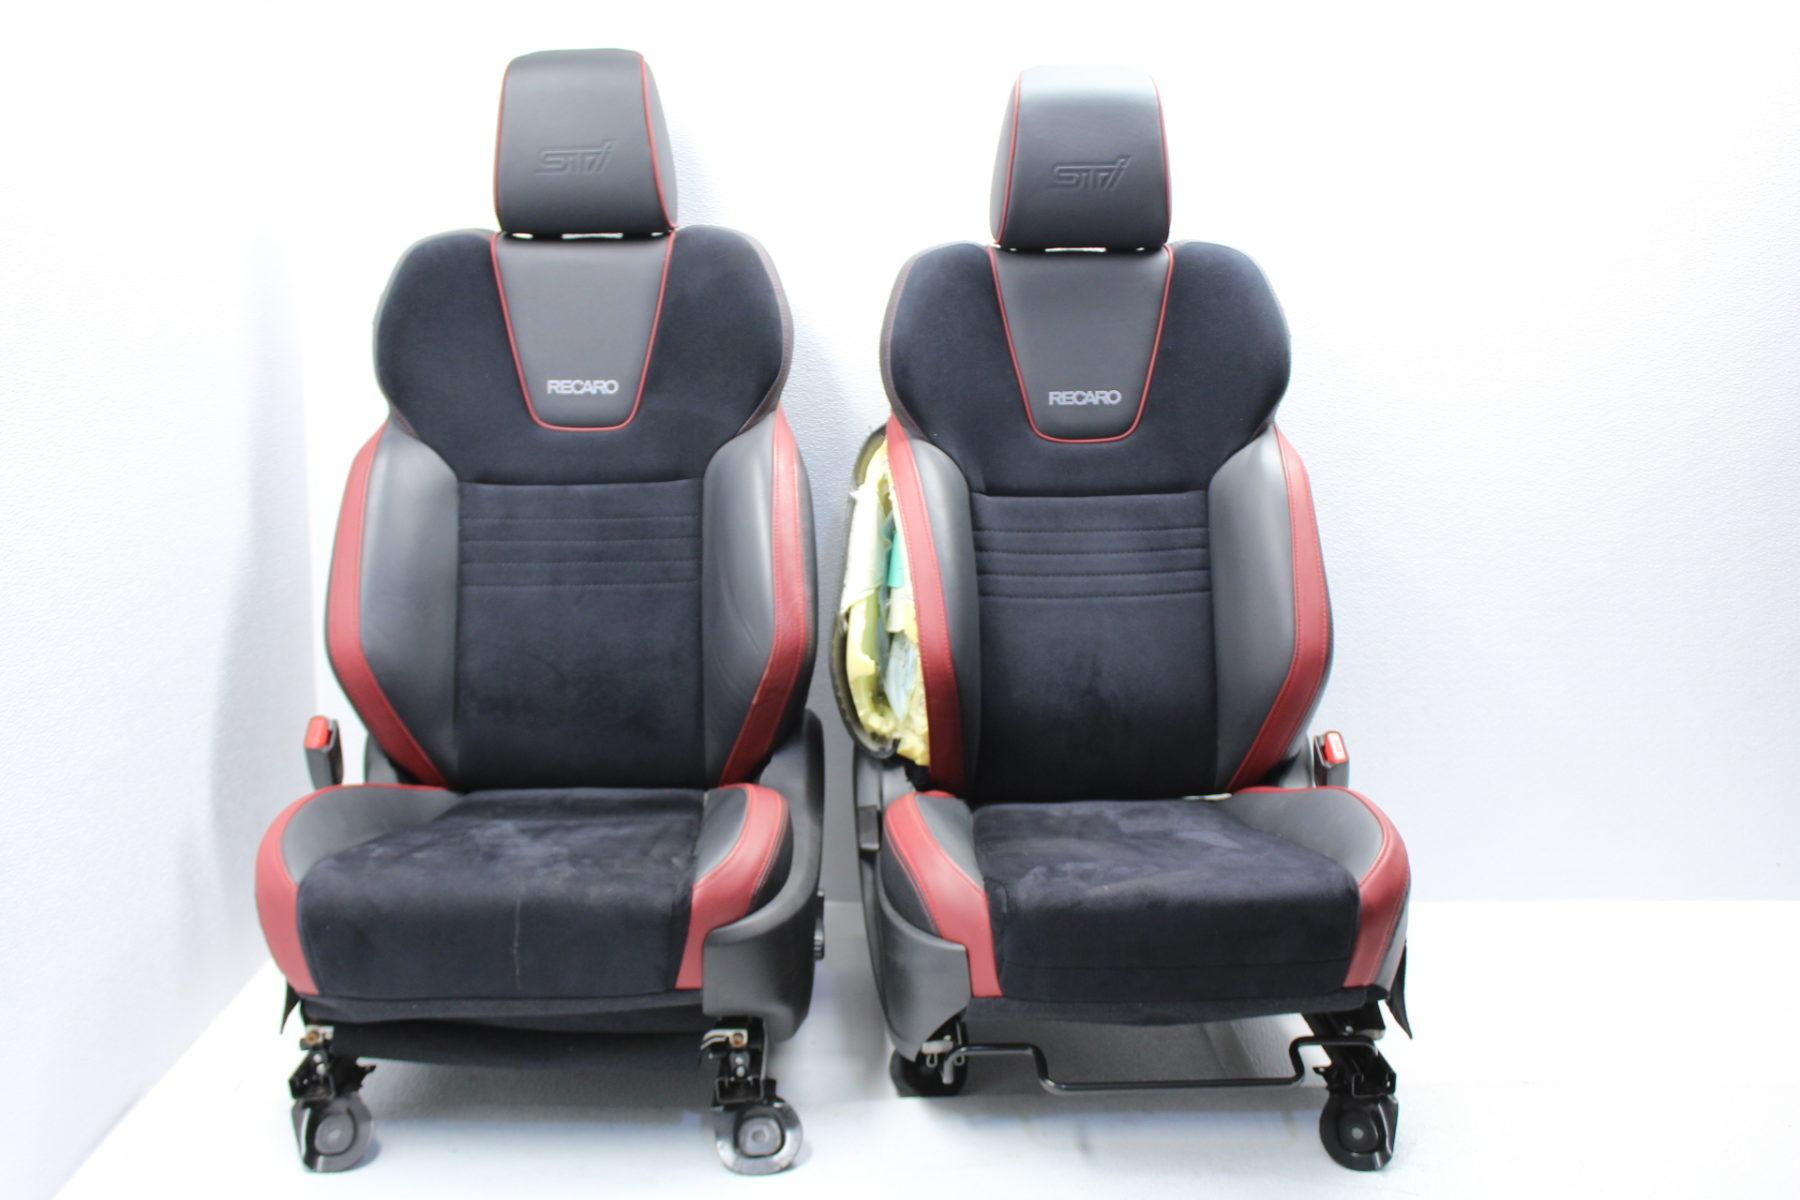 18 19 2018 2019 Subaru Wrx Sti Front Recaro Seats Leather Suede Oem Lh Rh Subieautoparts Com